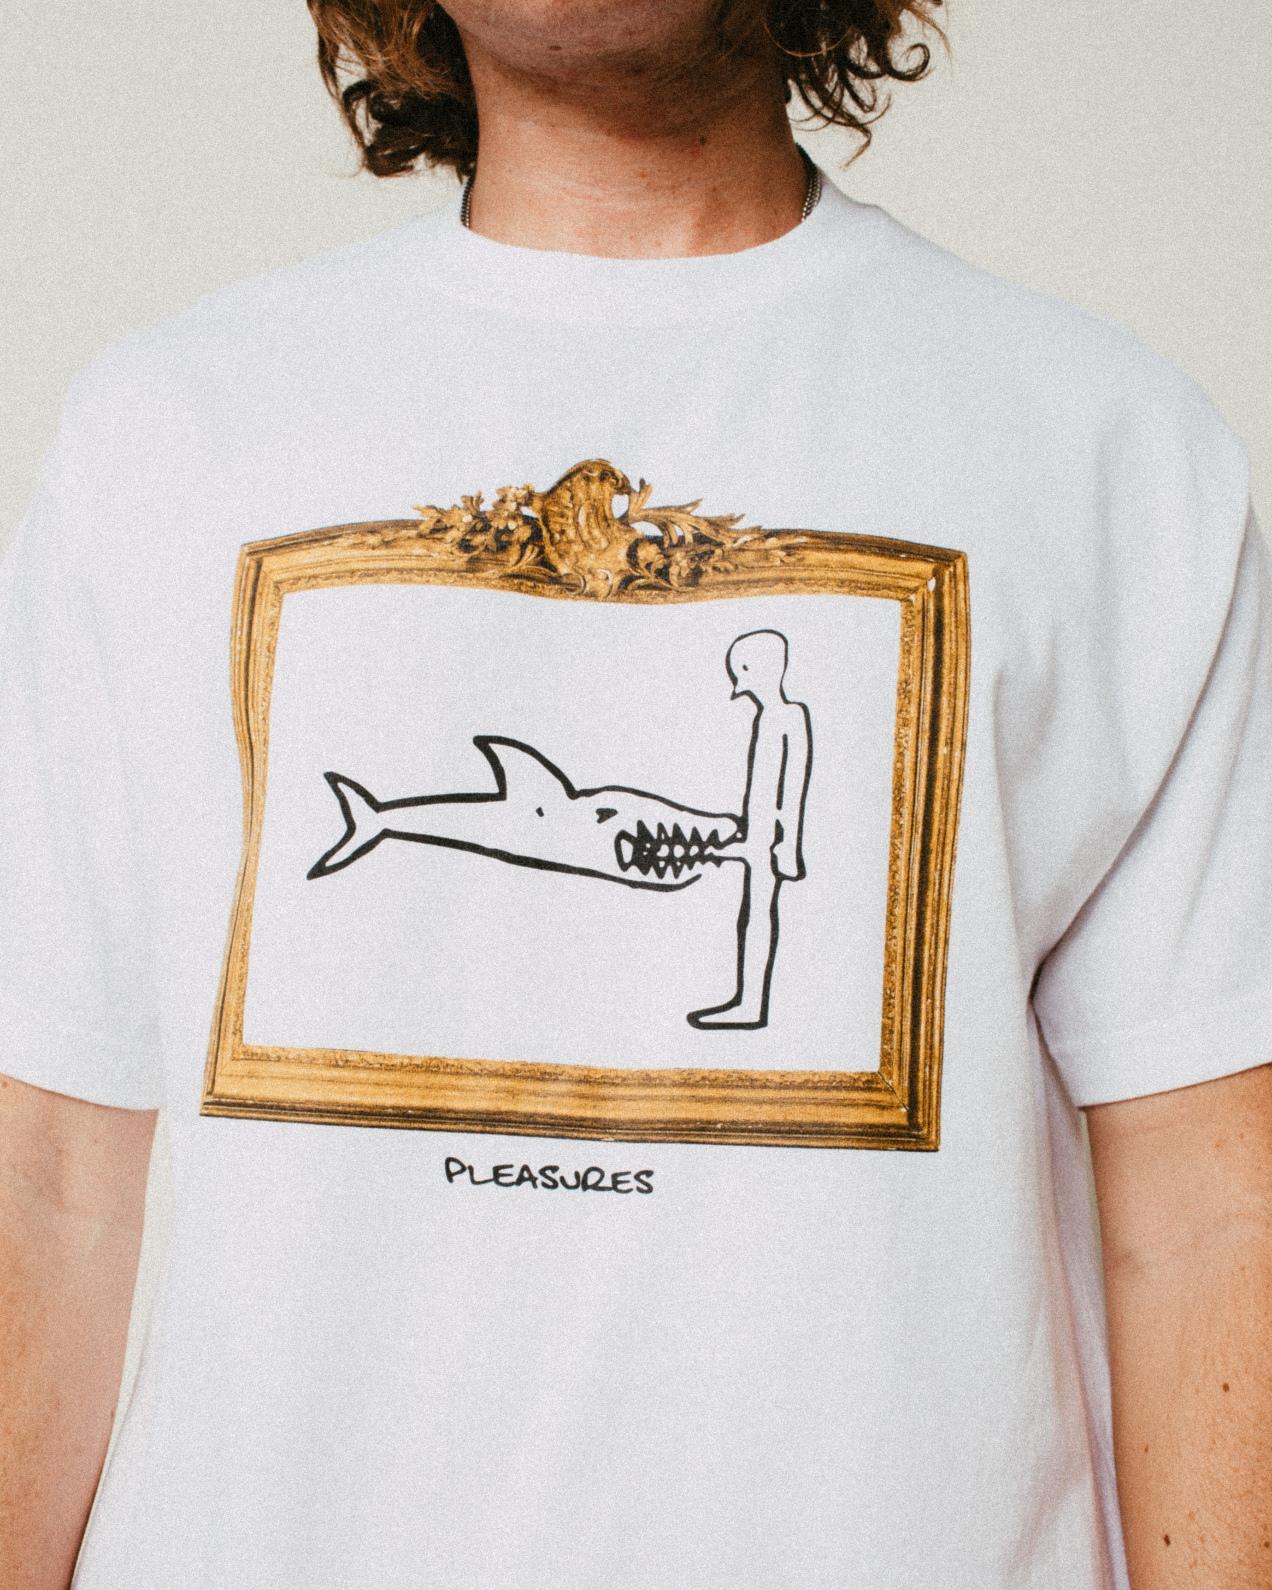 【PLEASURES/プレジャーズ】BITE T-SHIRT Tシャツ / WHITE